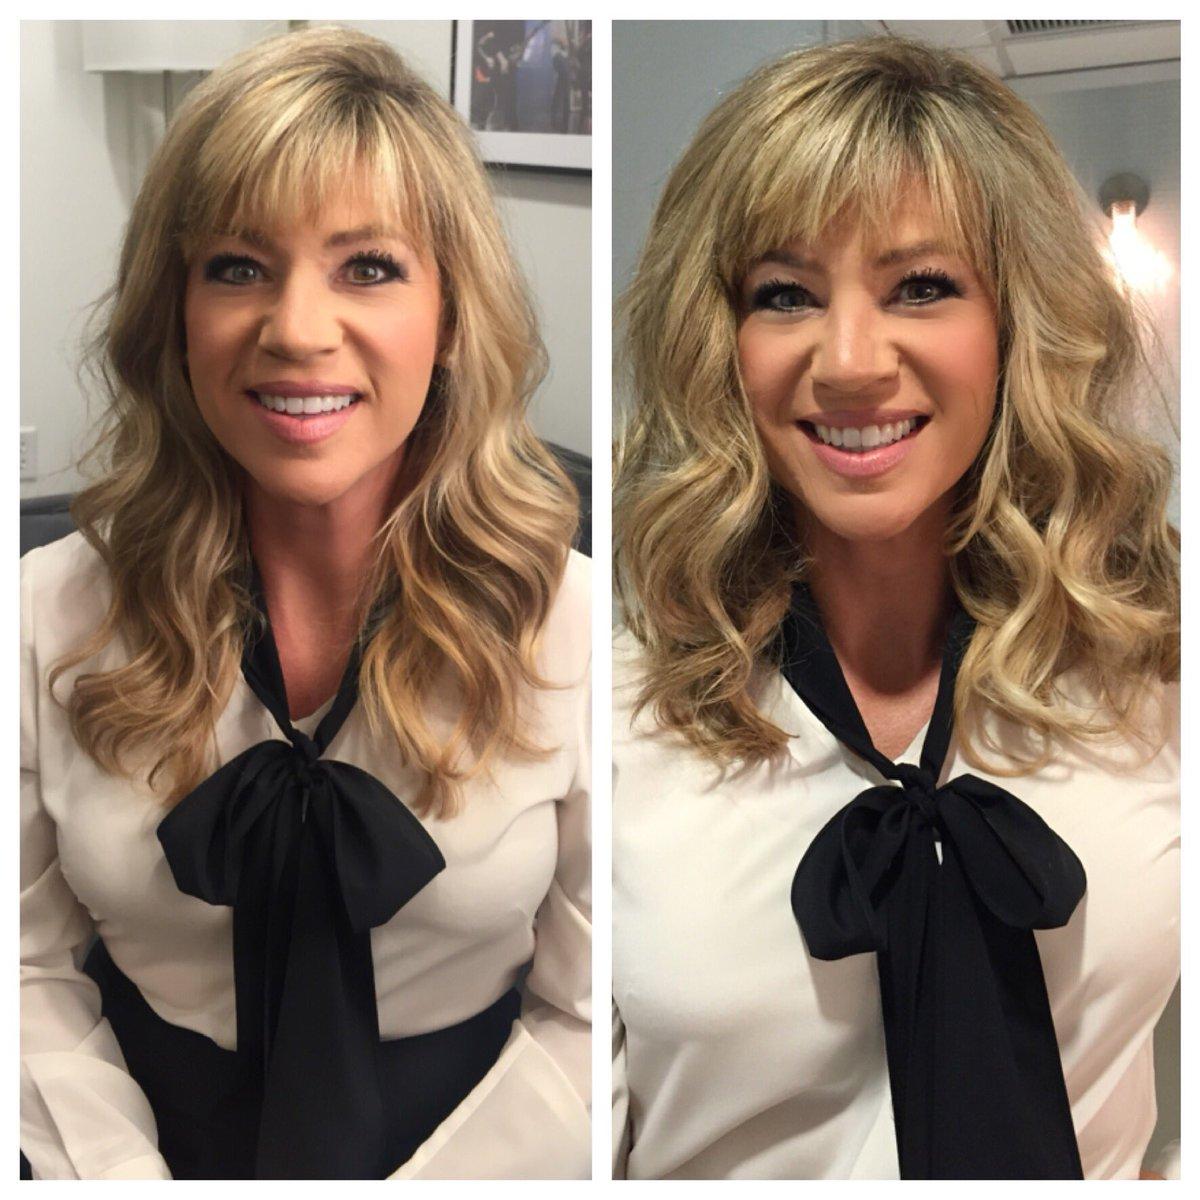 Amy Morrison On Twitter Va Va Voom Look At How Full My Hair Is